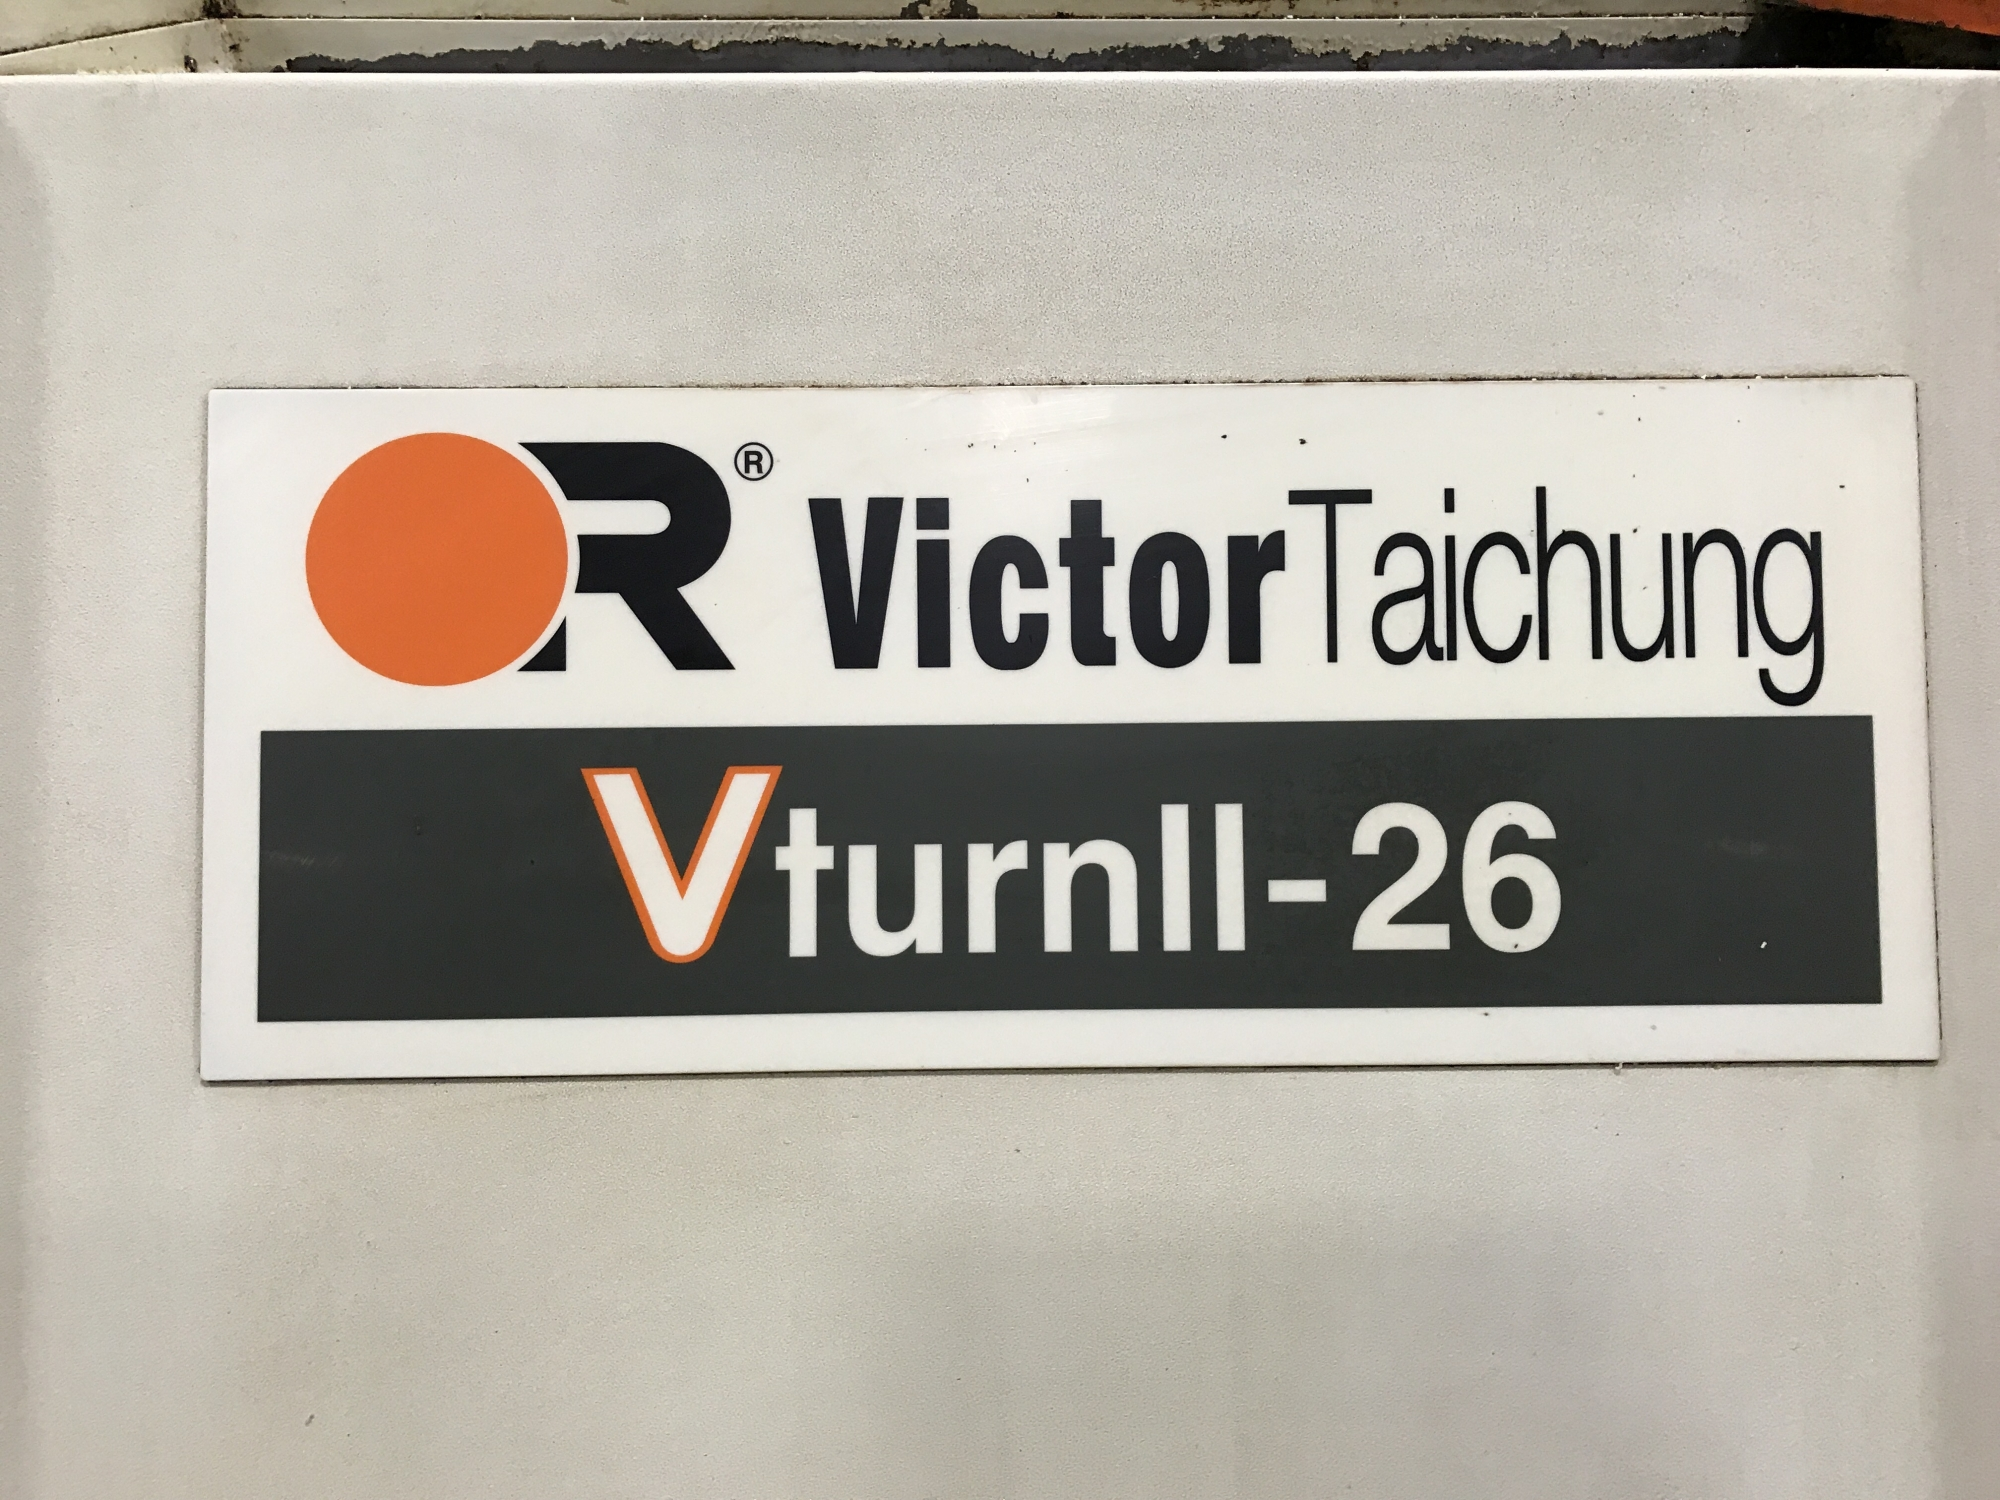 2007 Victor VturnII-26 - CNC Horizontal Lathe